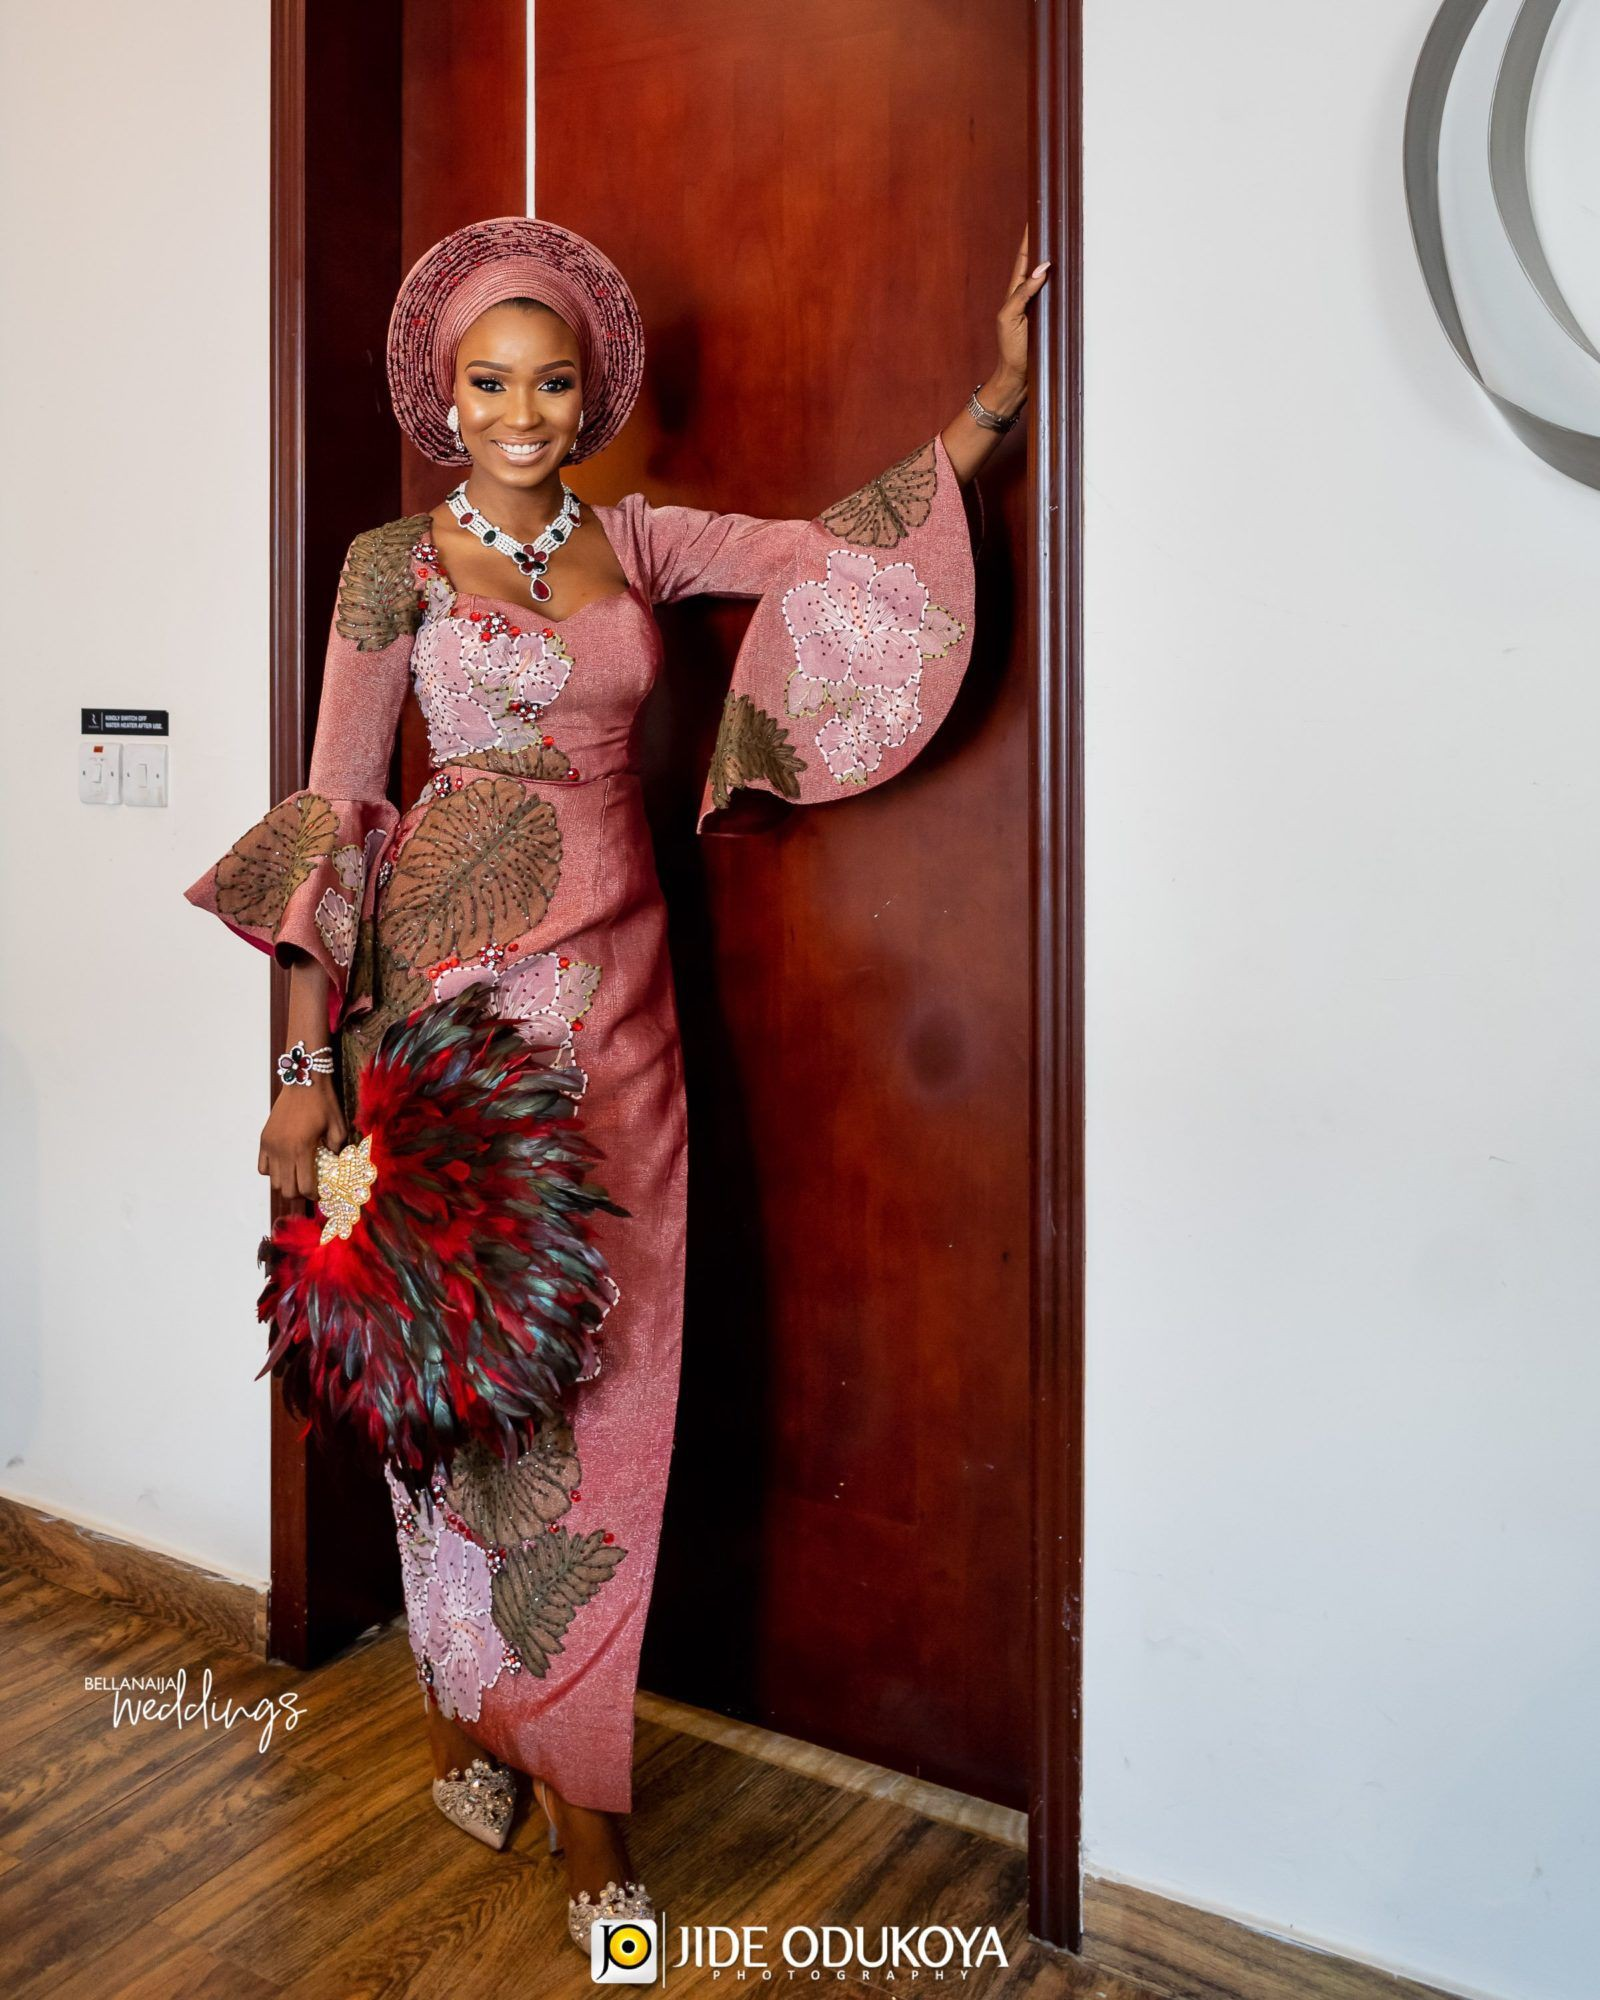 Traditional bella naija wedding, Wedding dress